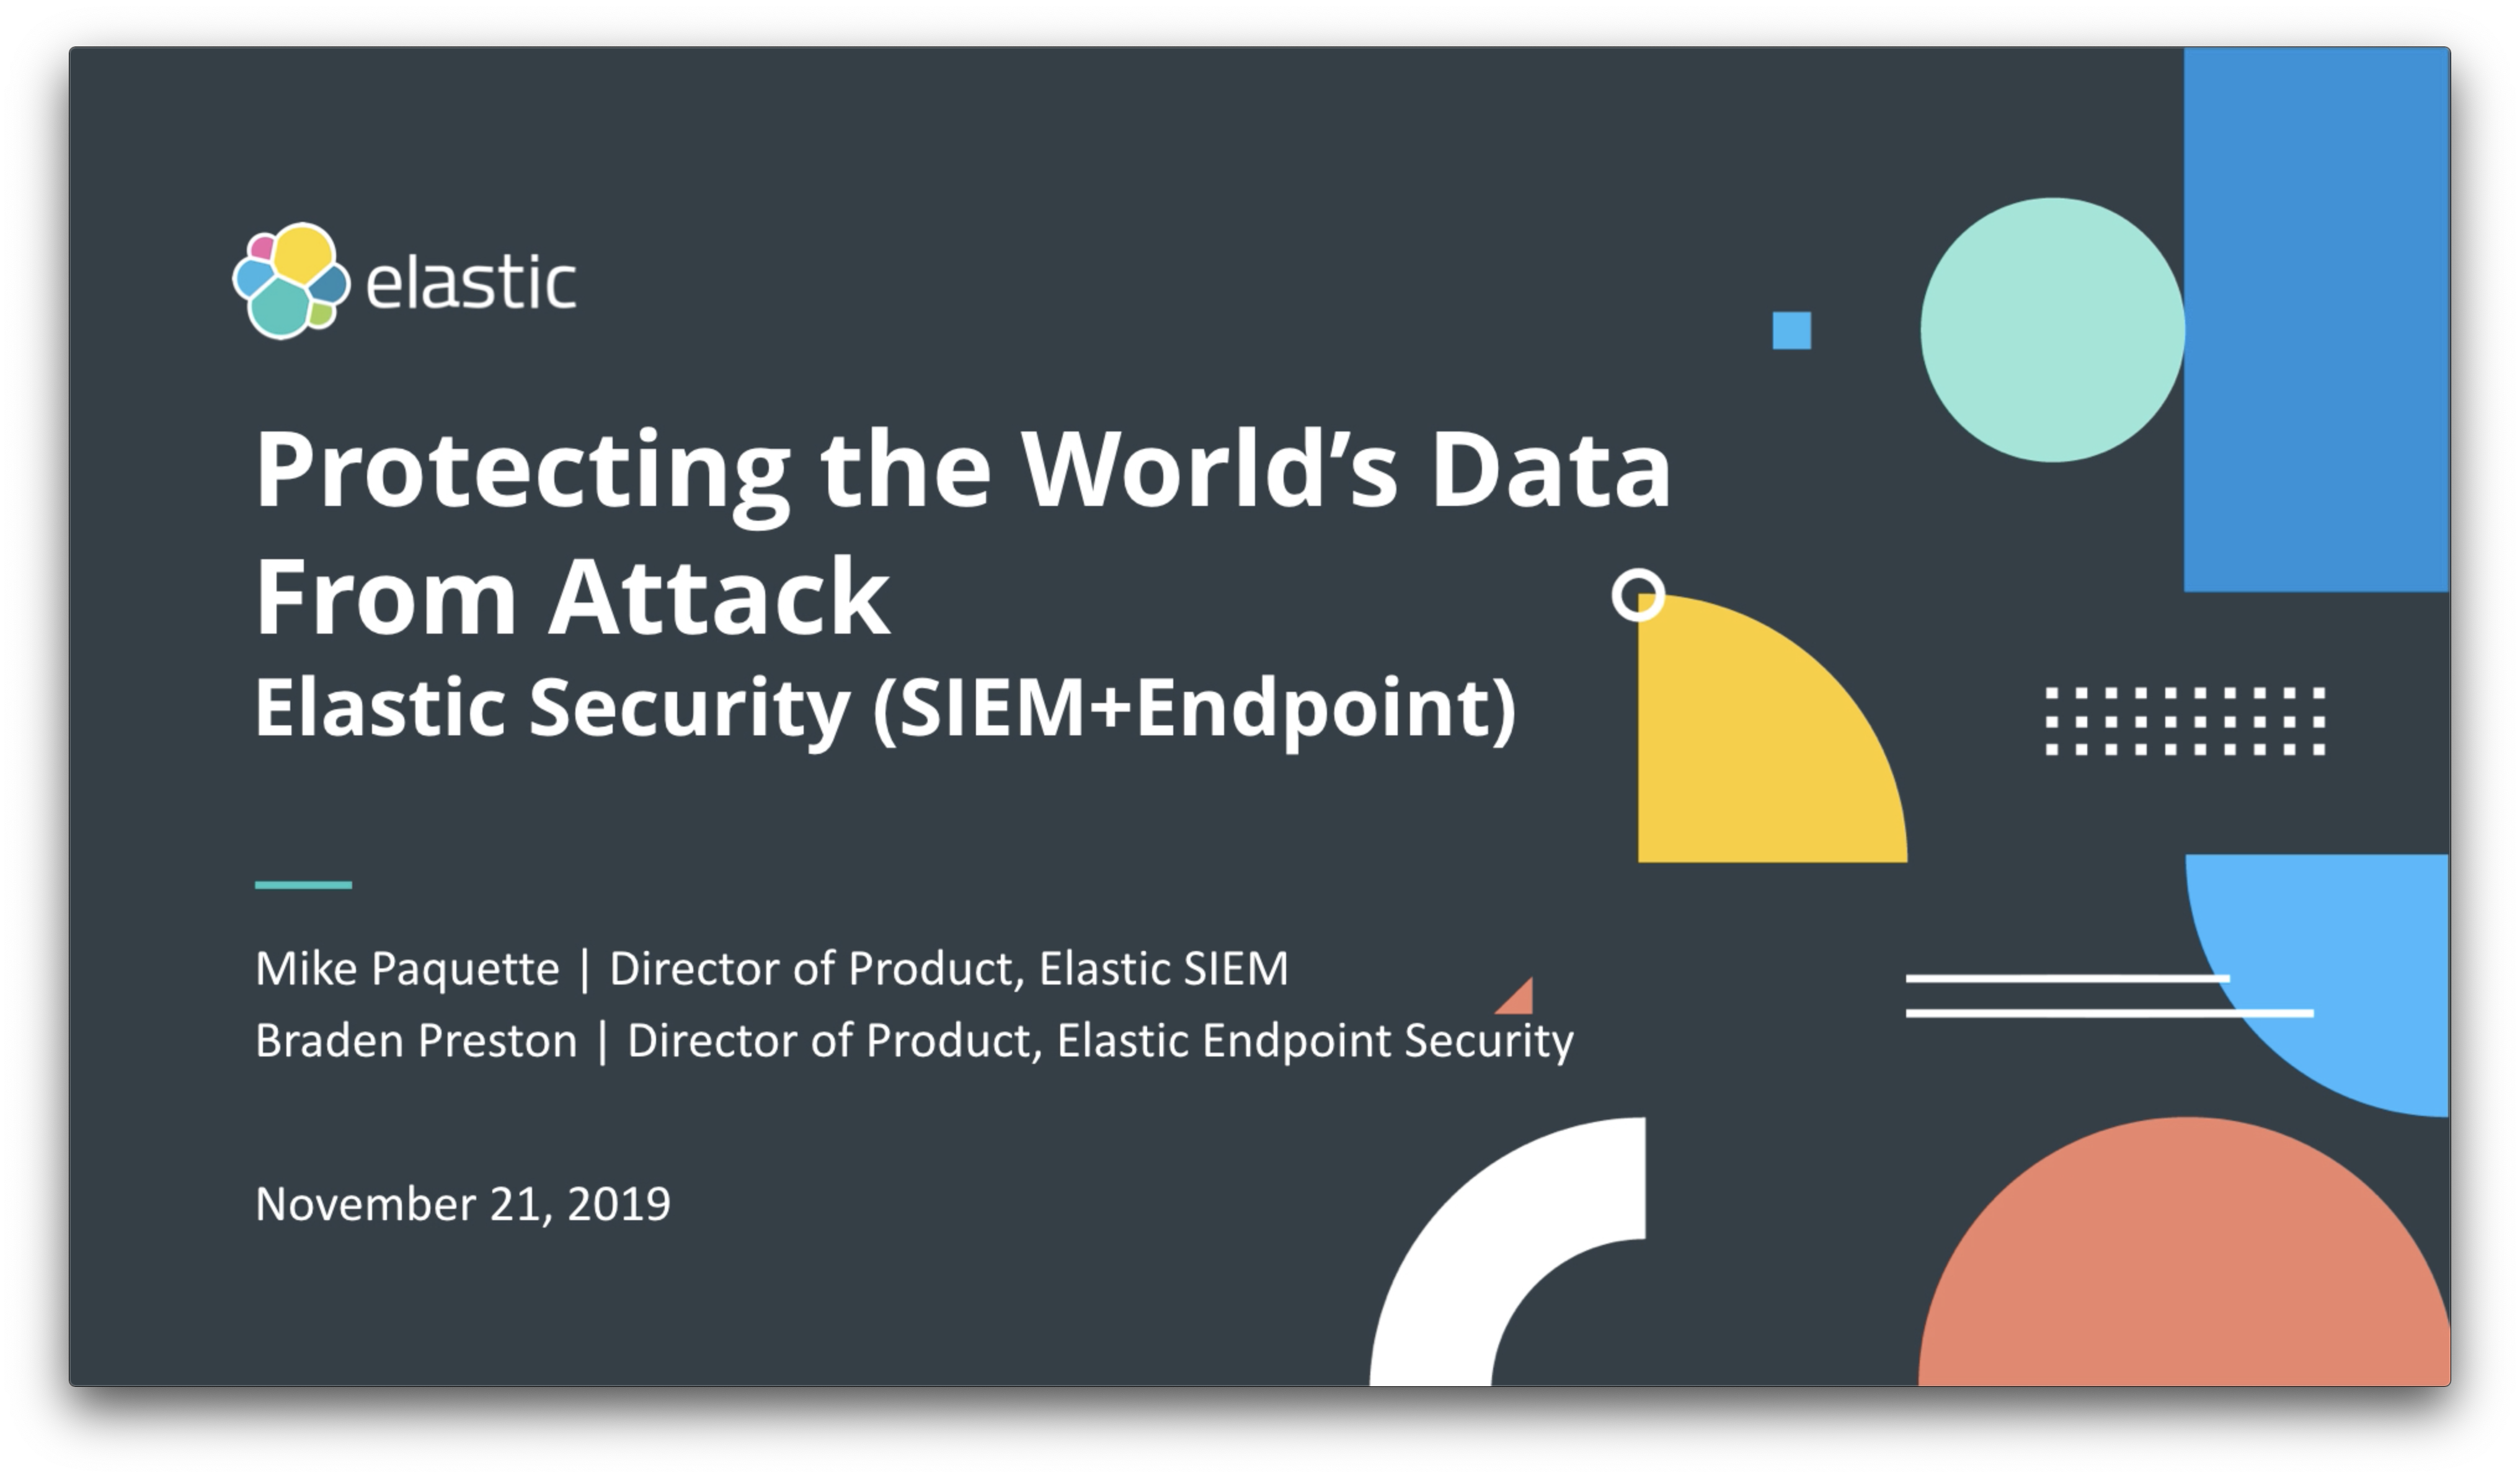 Video for Überblick über Elastic Endpoint Security: Security beginnt am Endpunkt